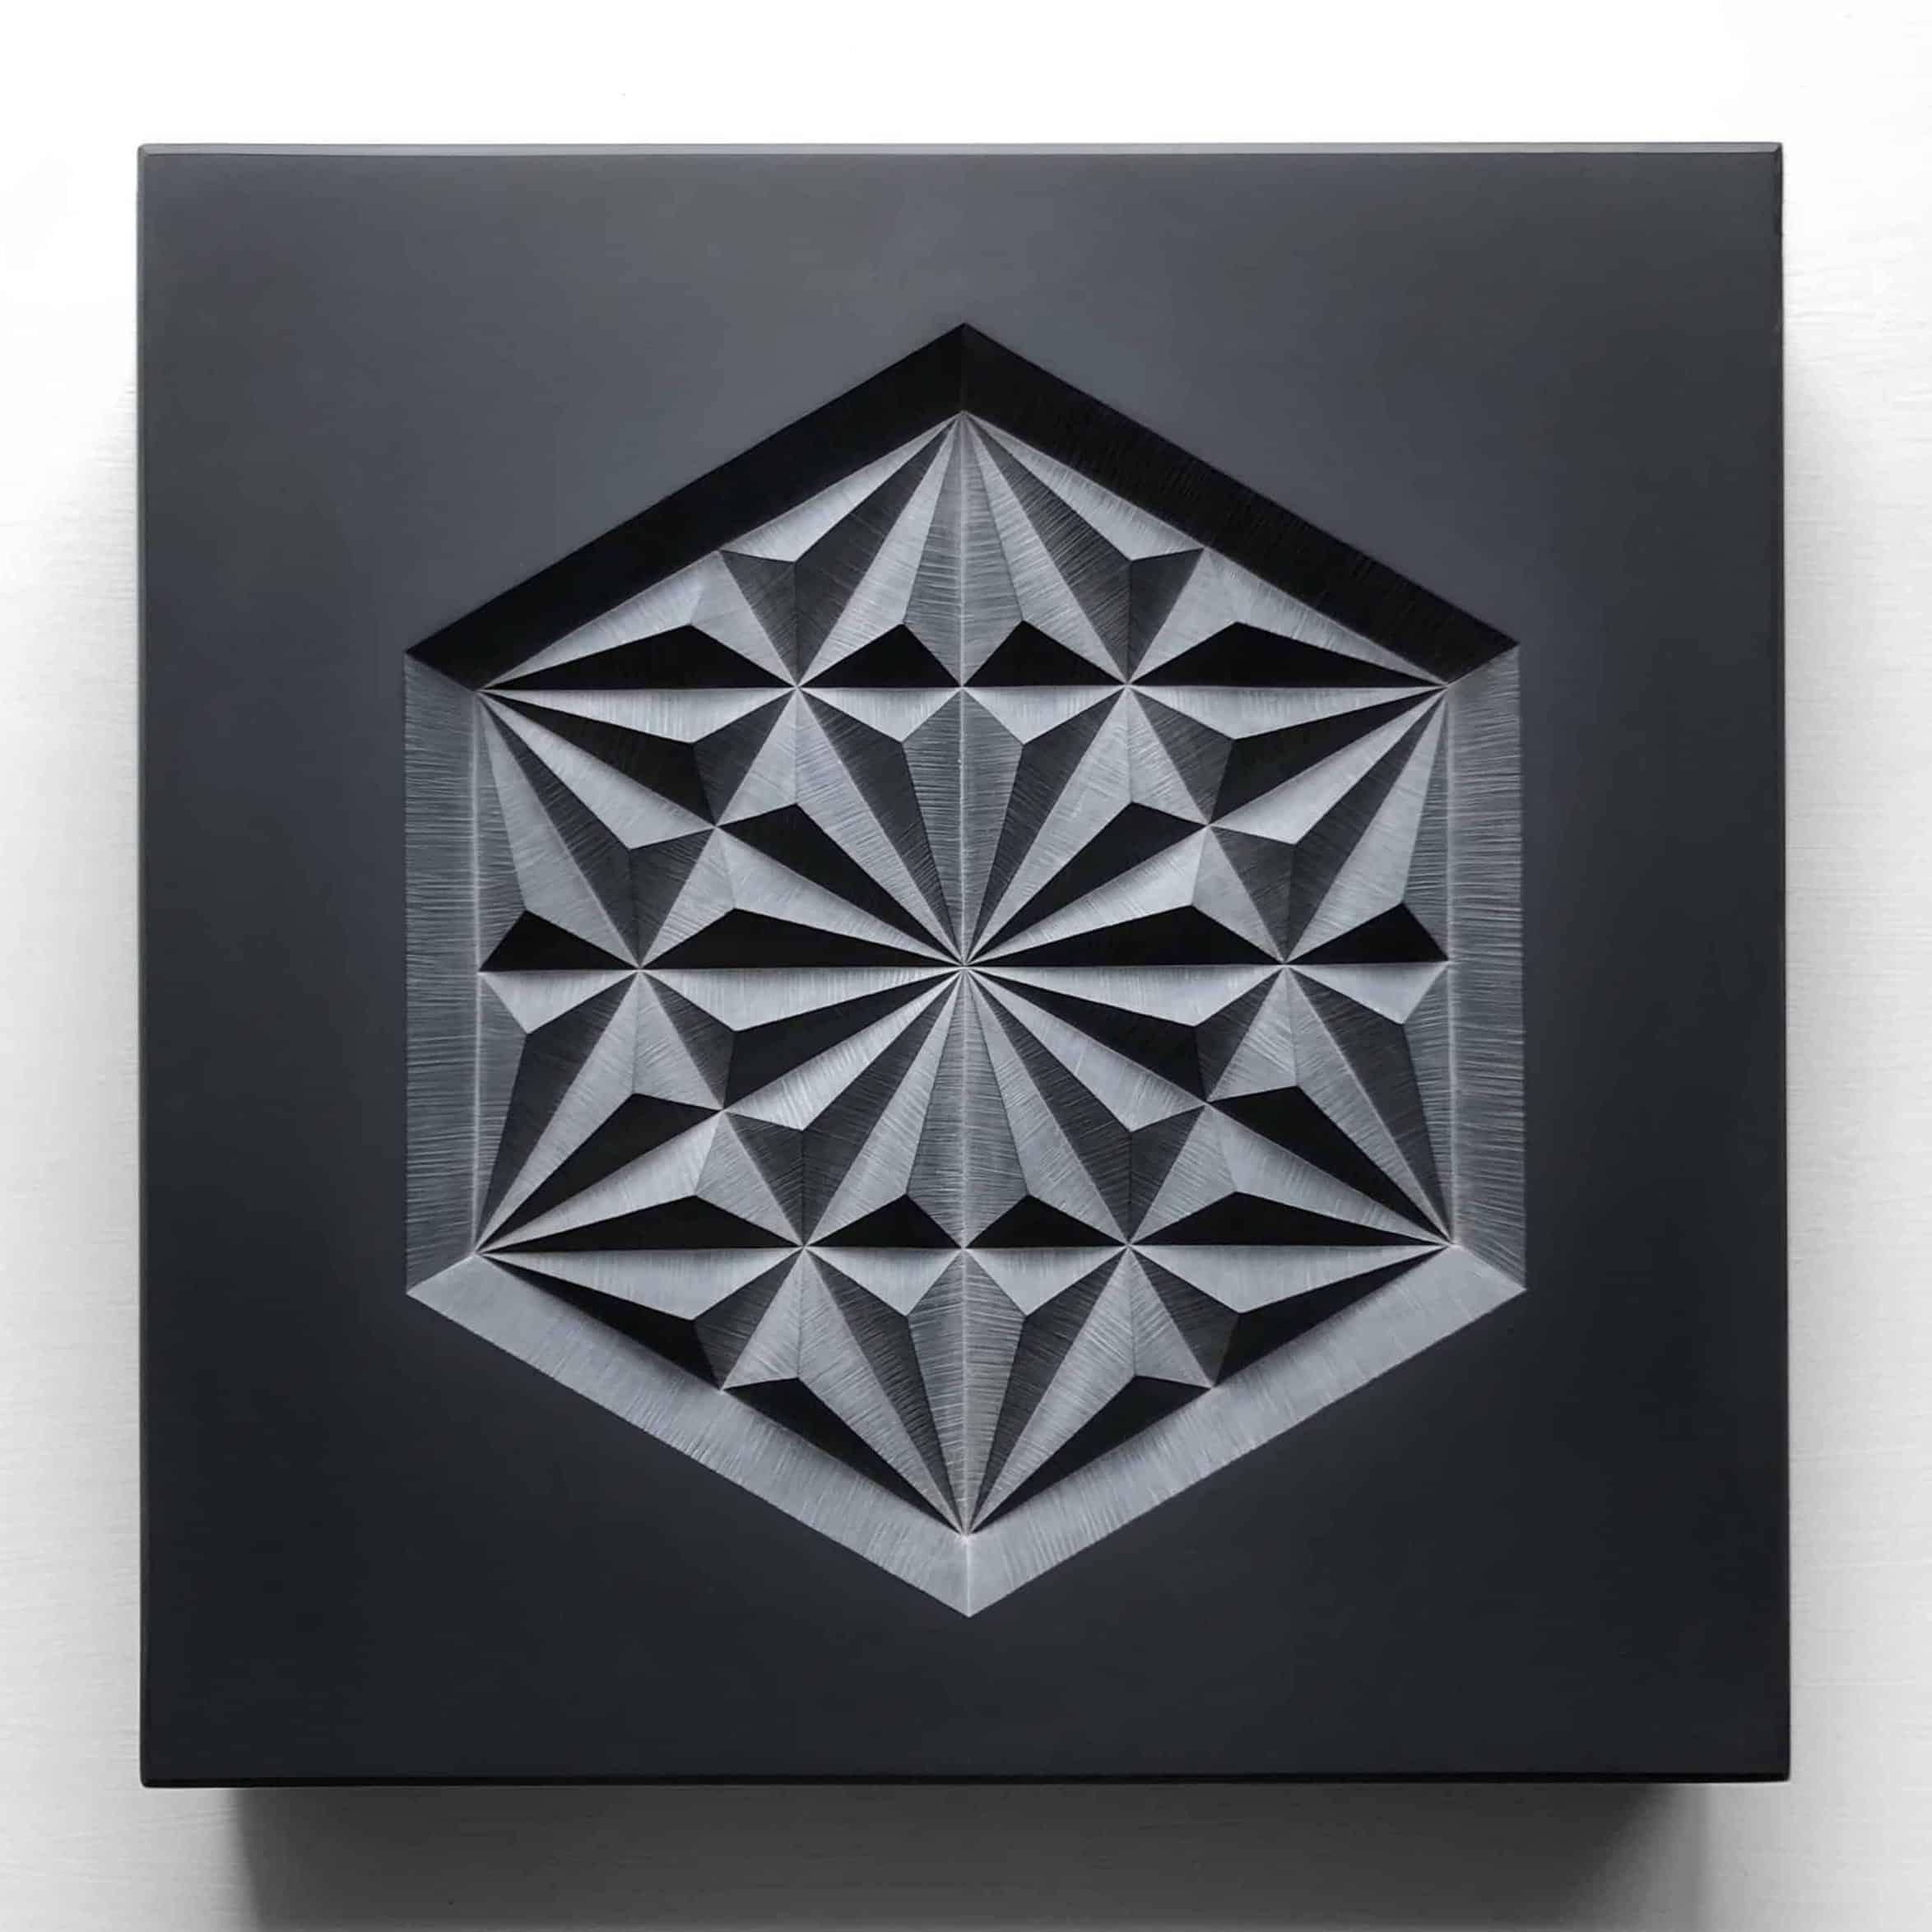 Carved geometric pattern in slate